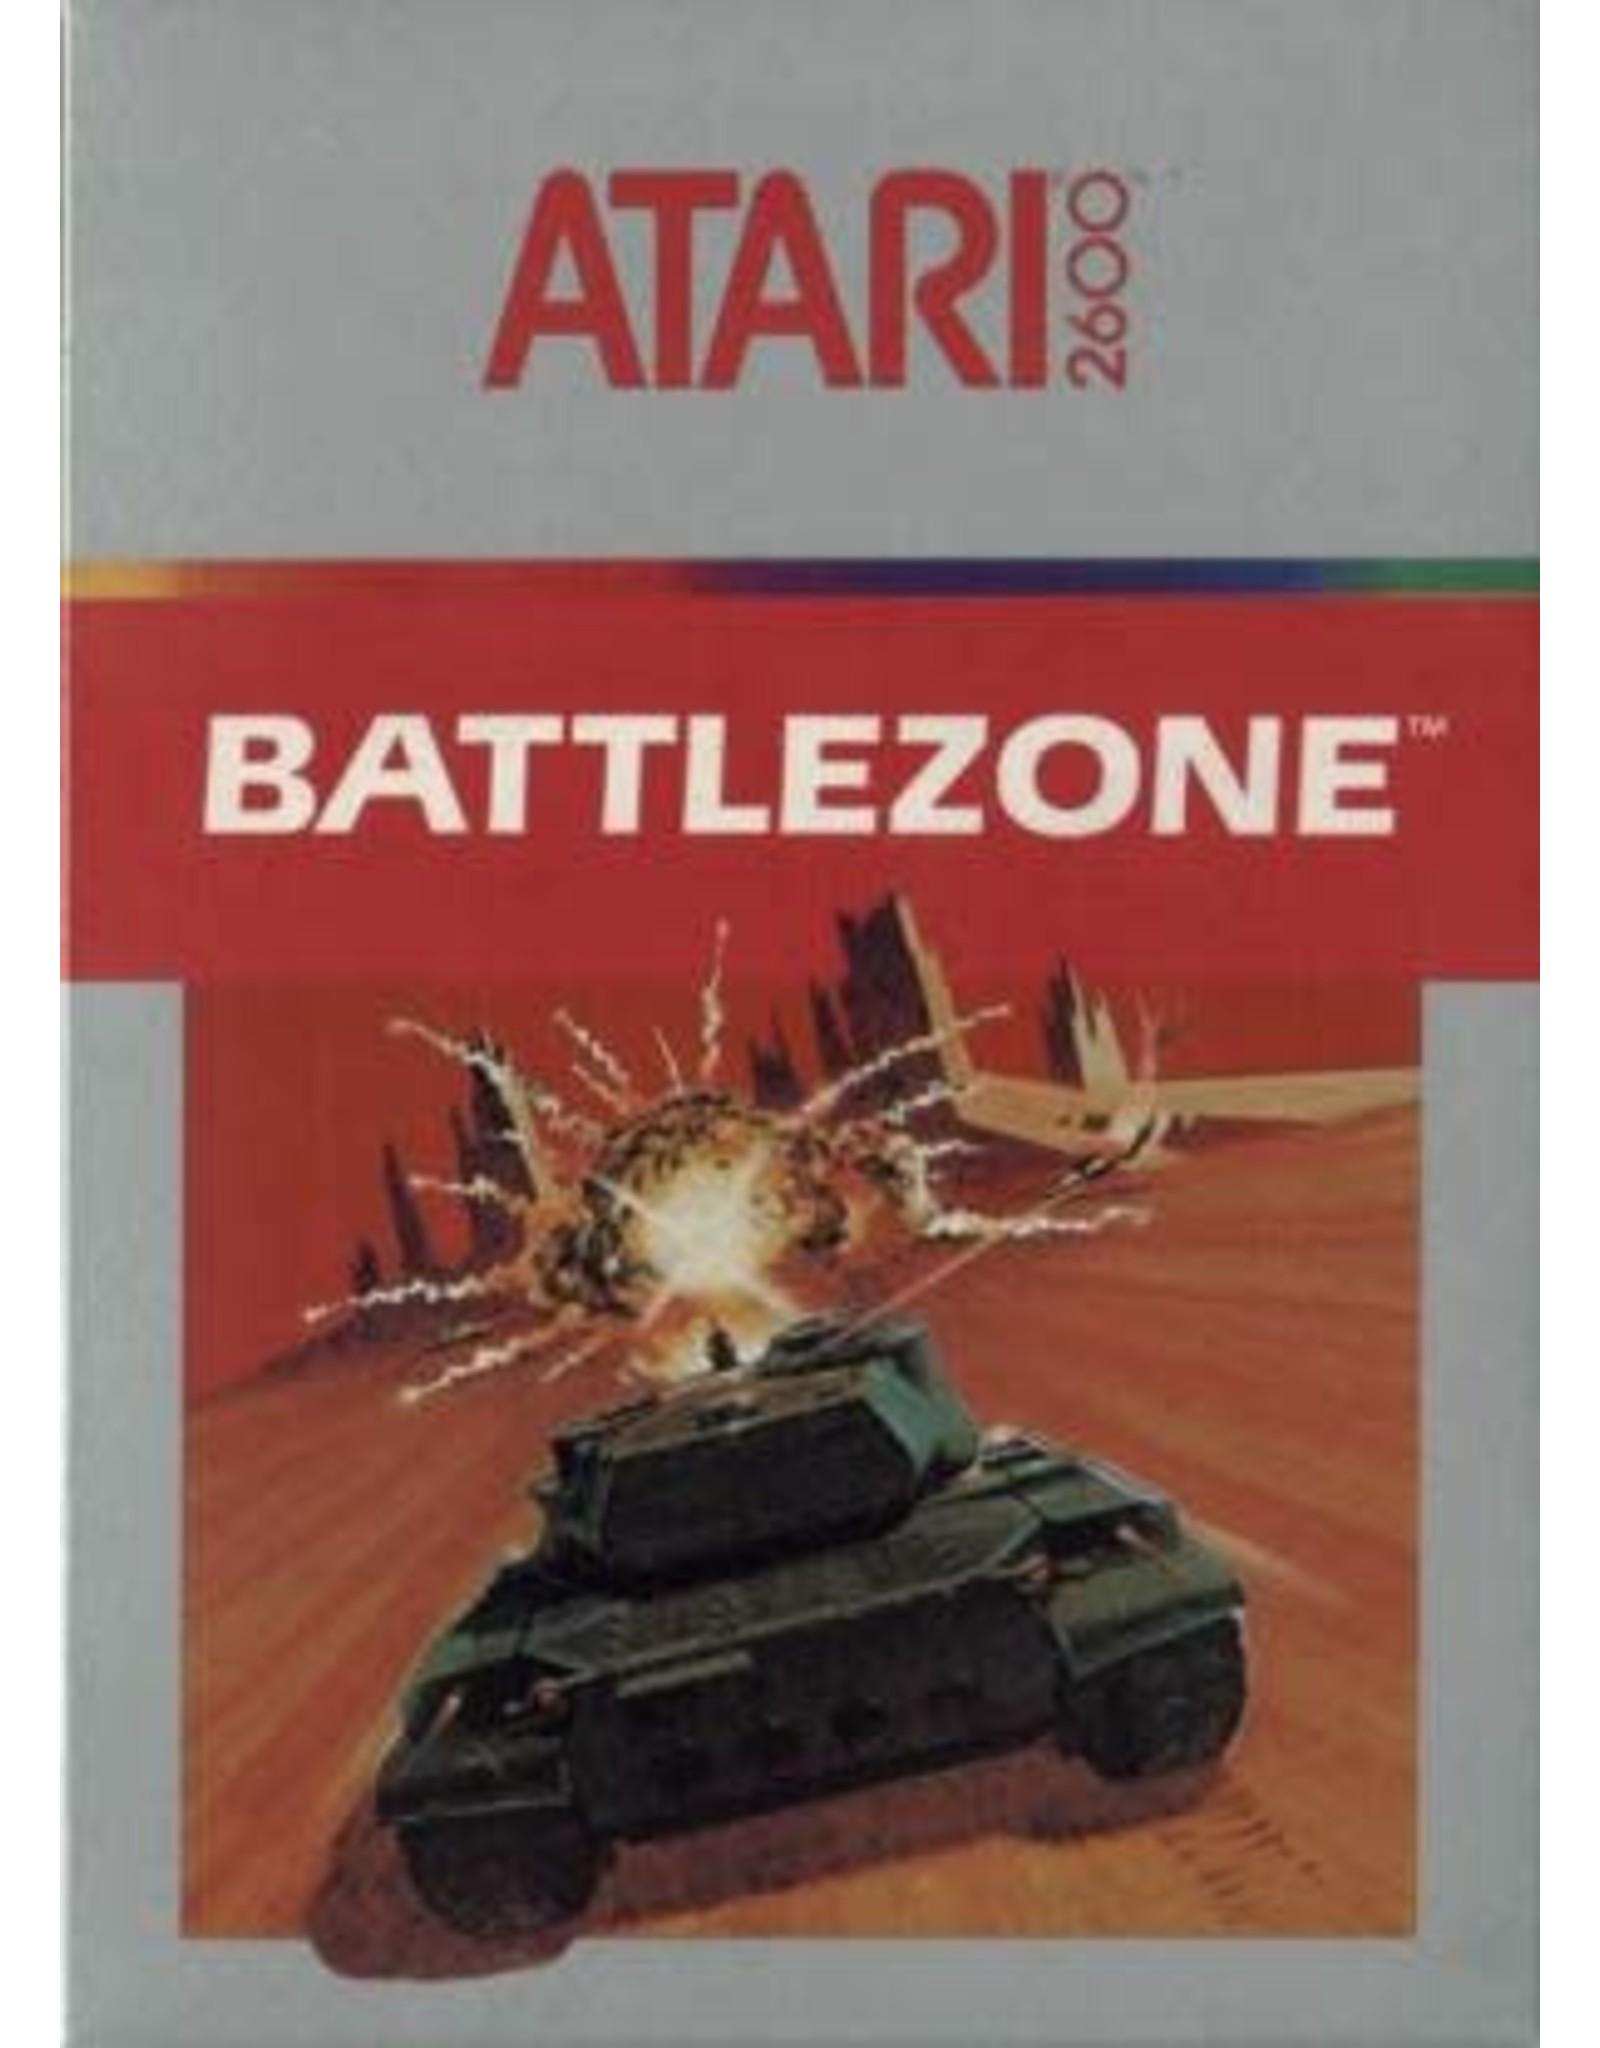 Atari 2600 Battlezone (Cart Only, Damaged Label)